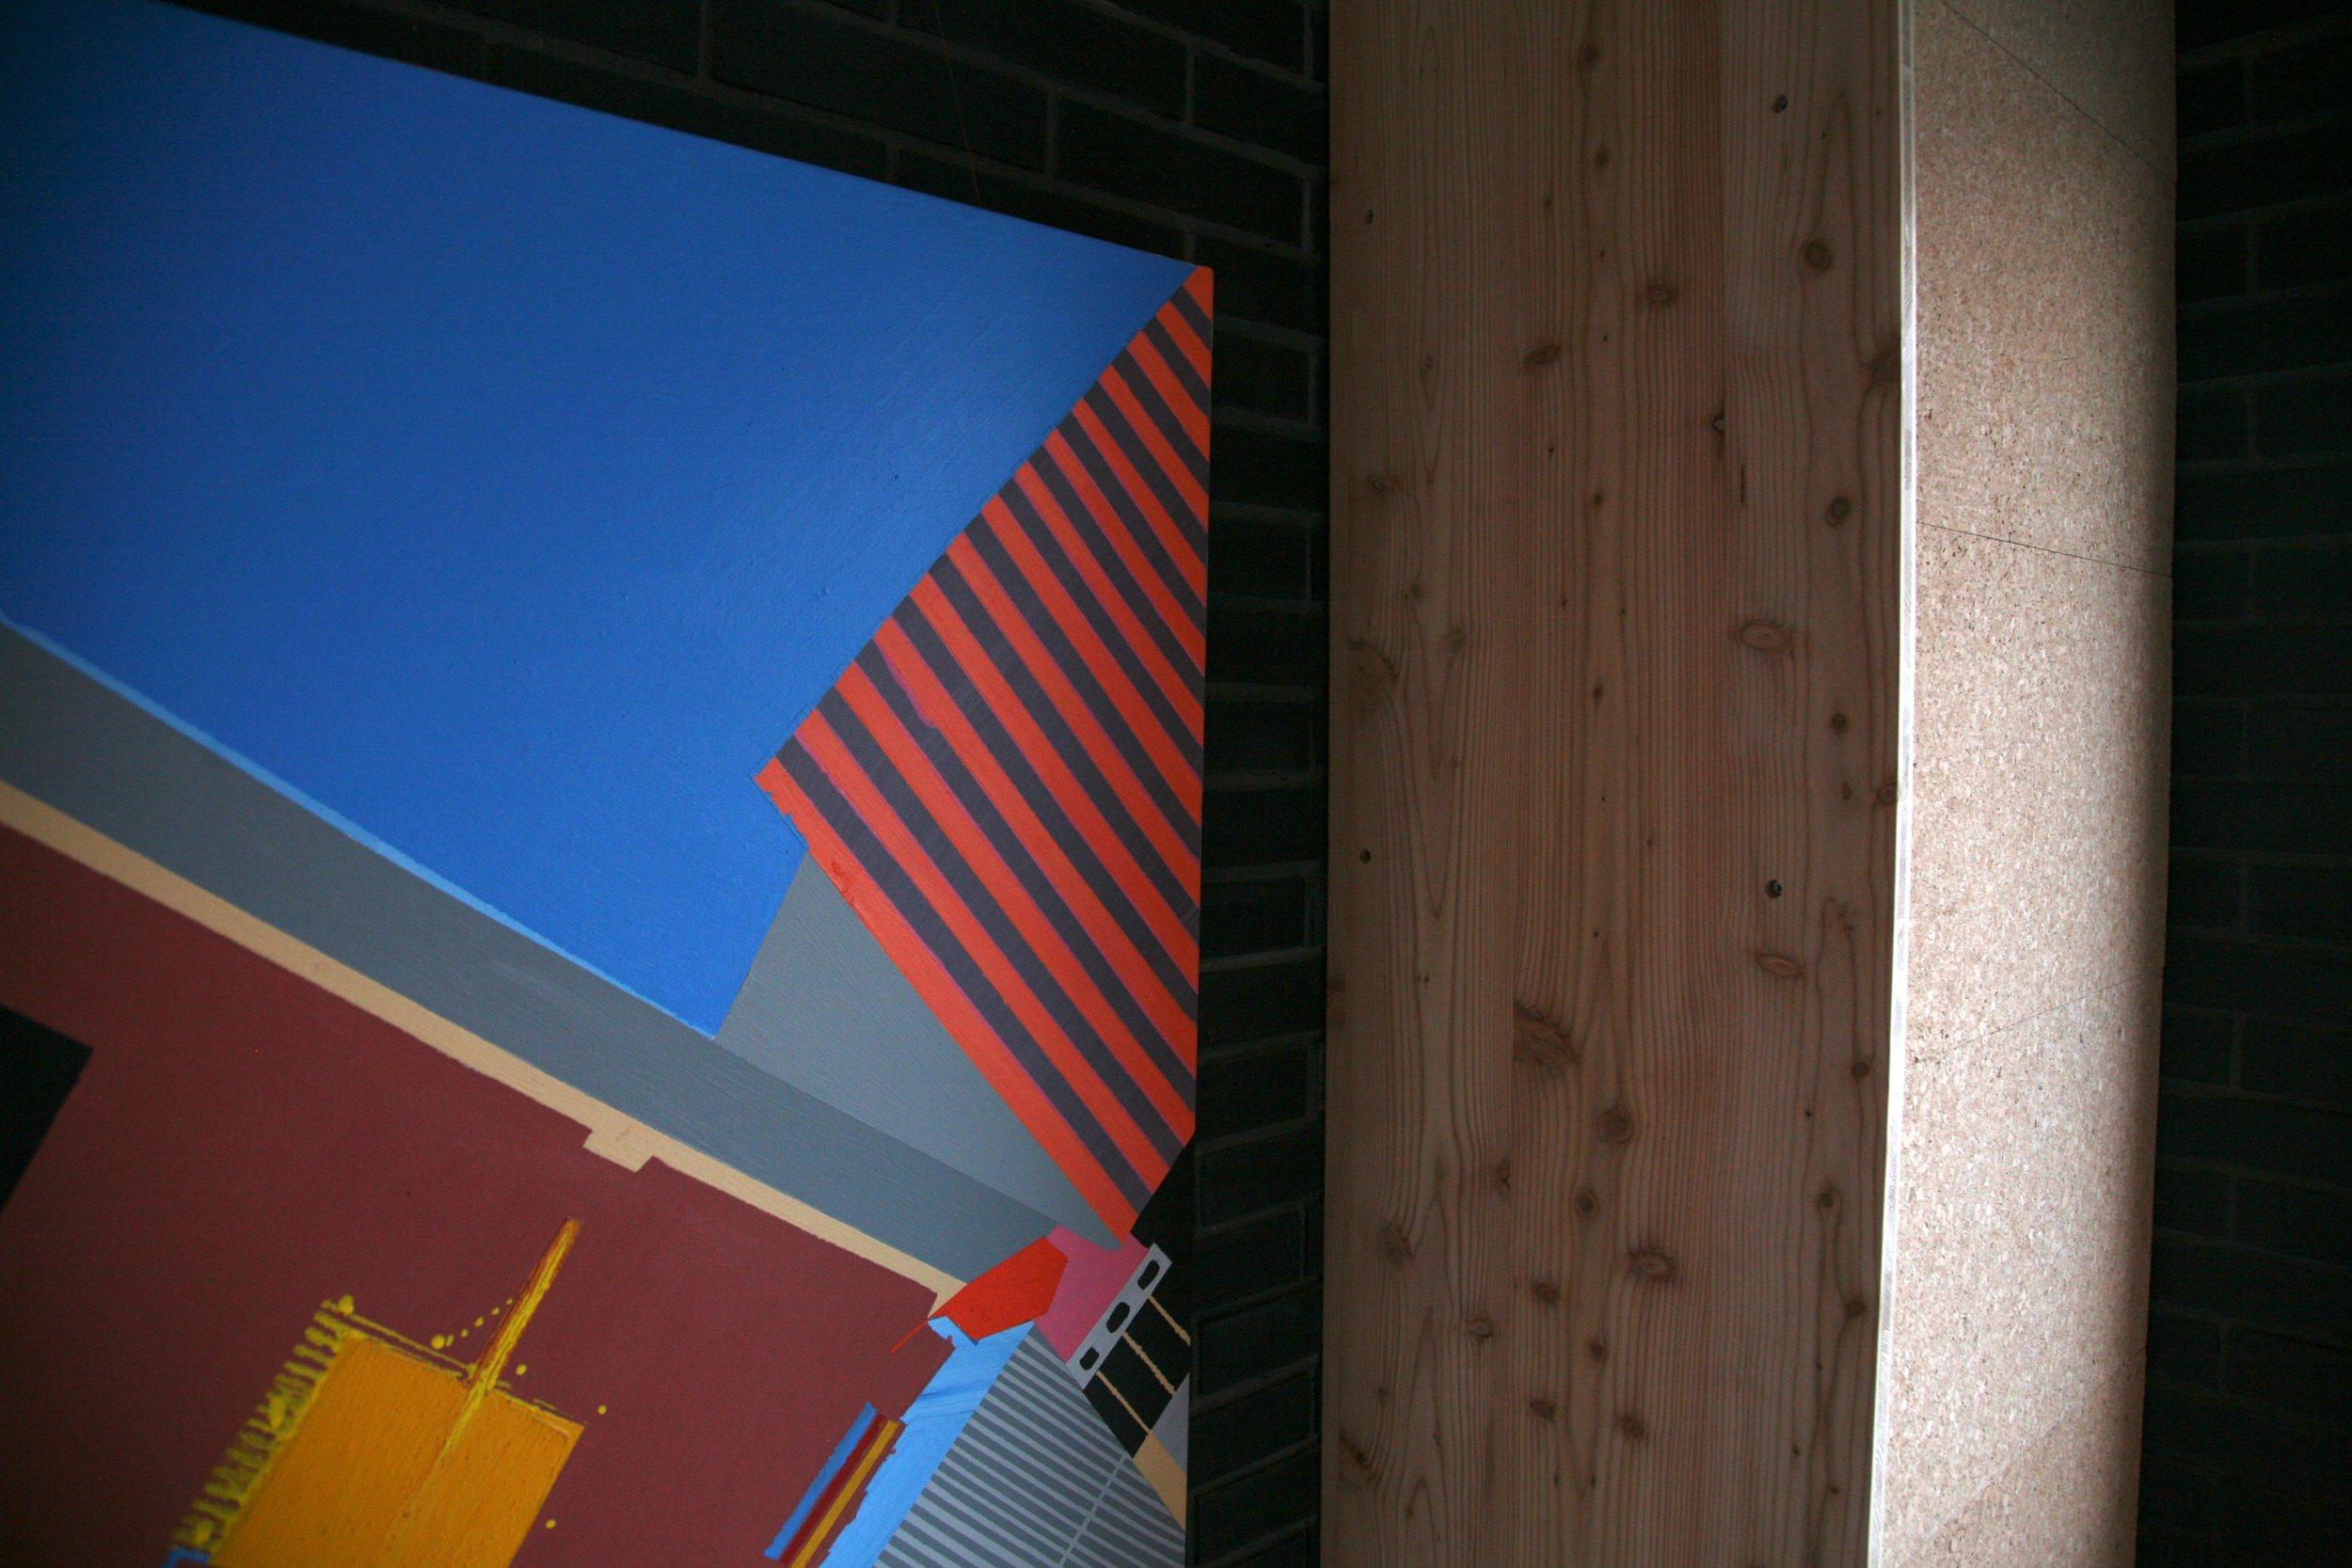 Construcao at The Shadow House TG 17.jpg